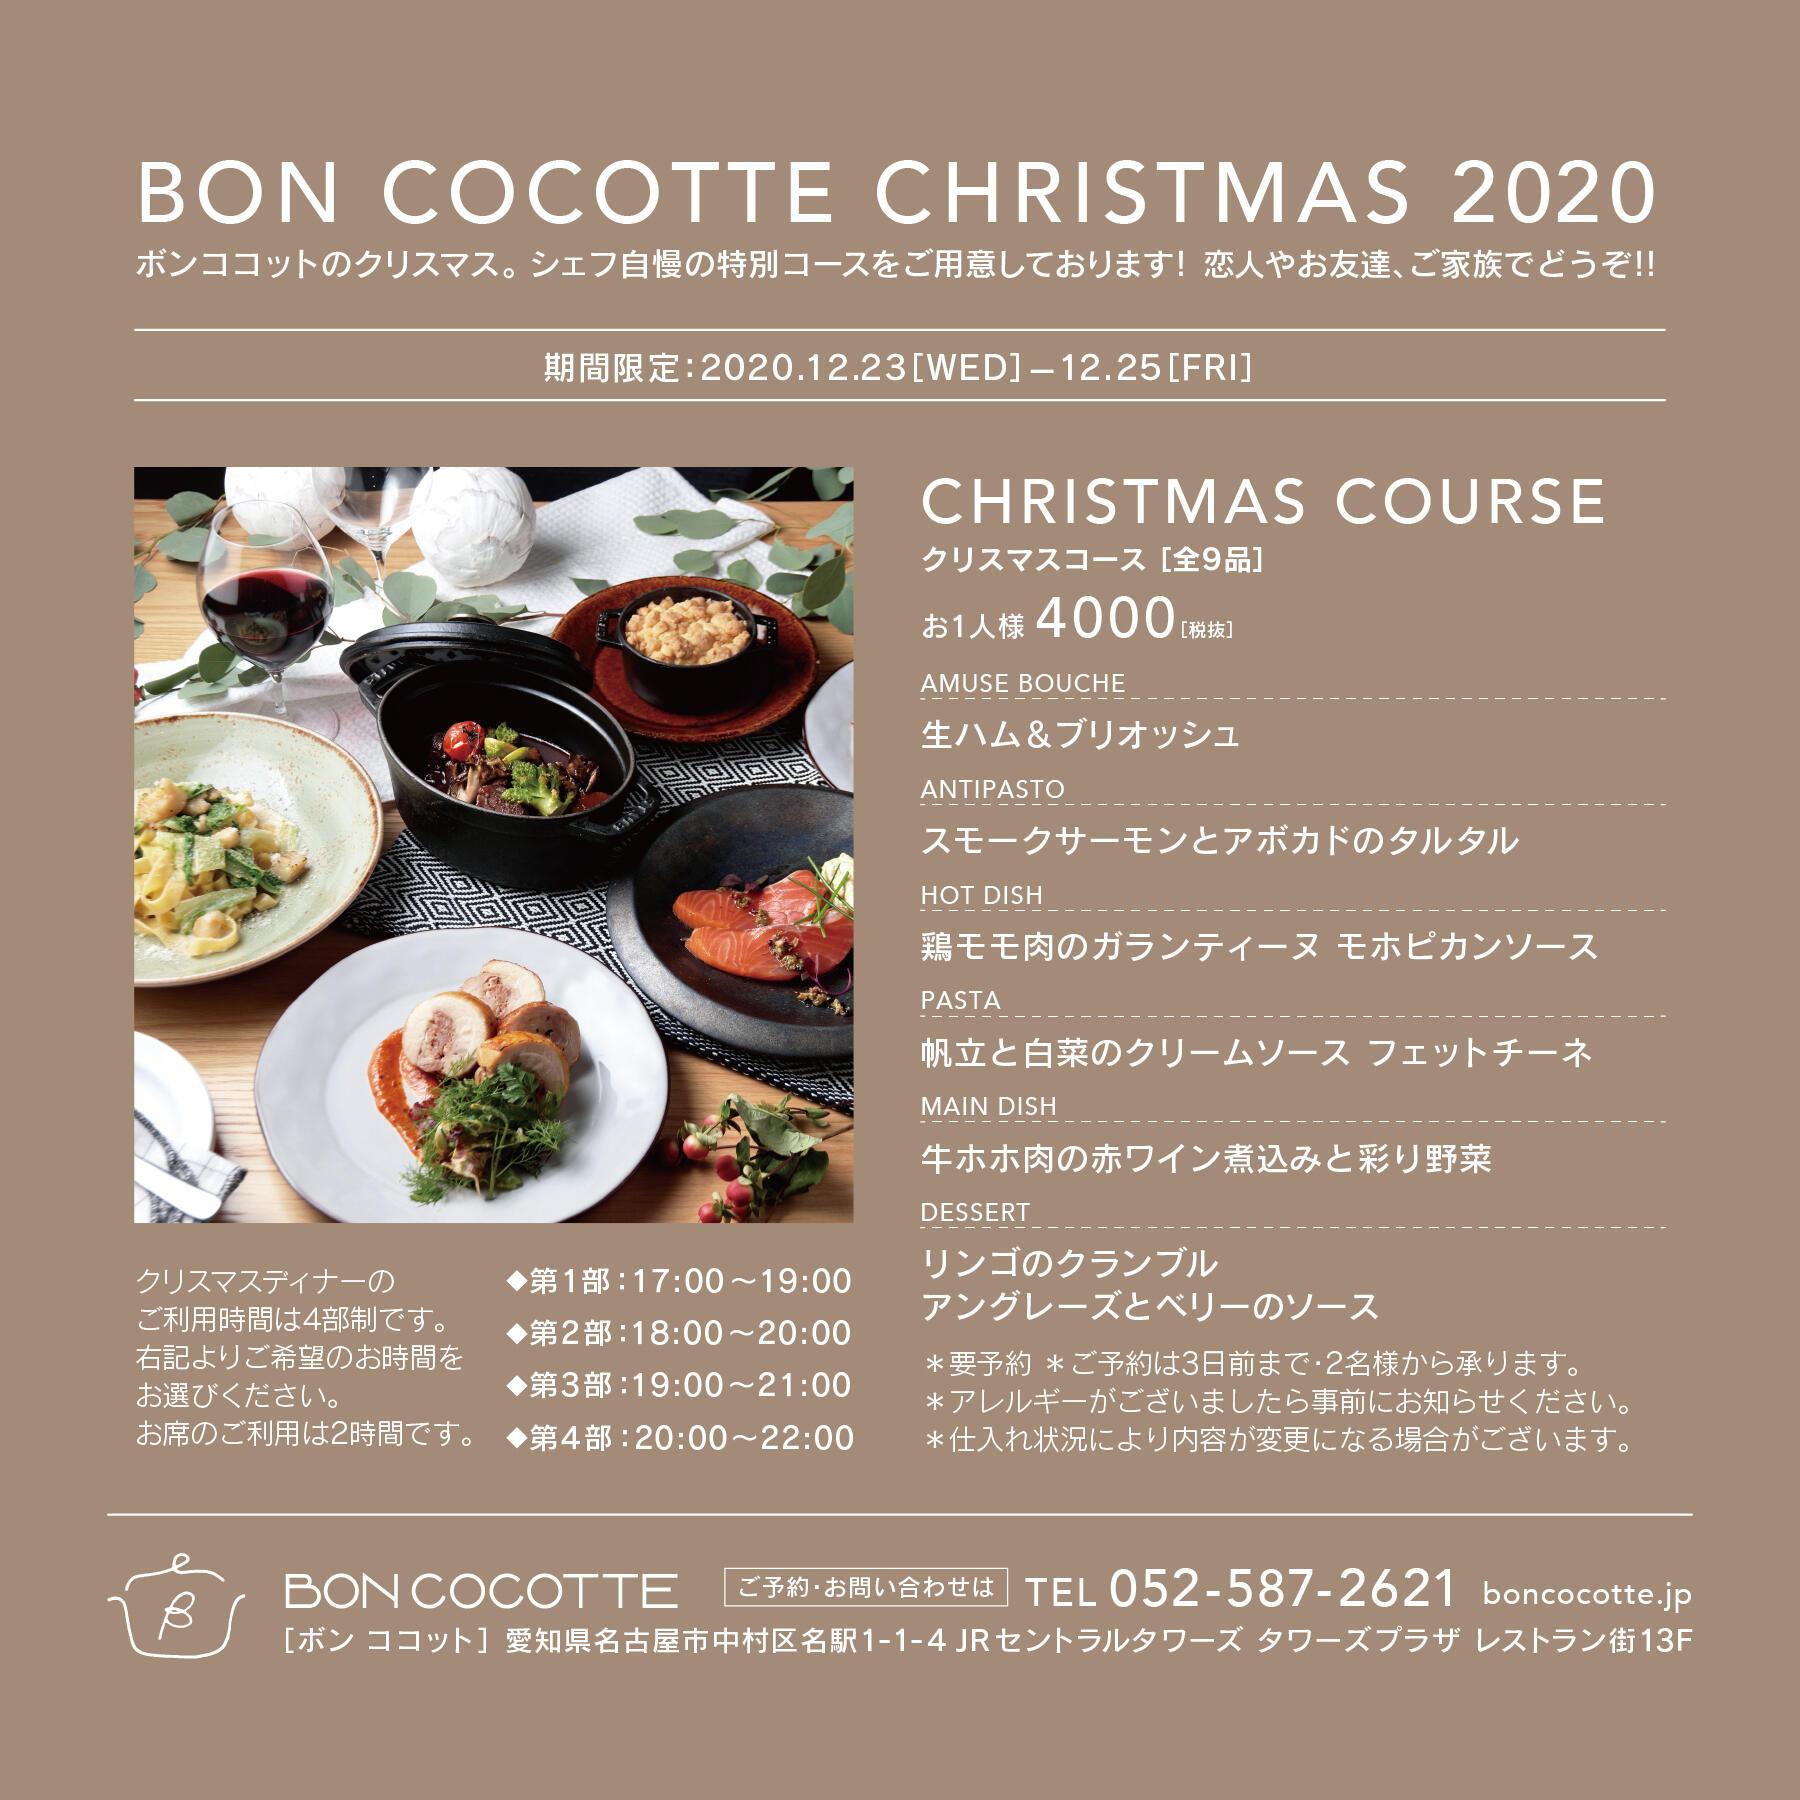 boncocotte_201123_xmas_main.jpg